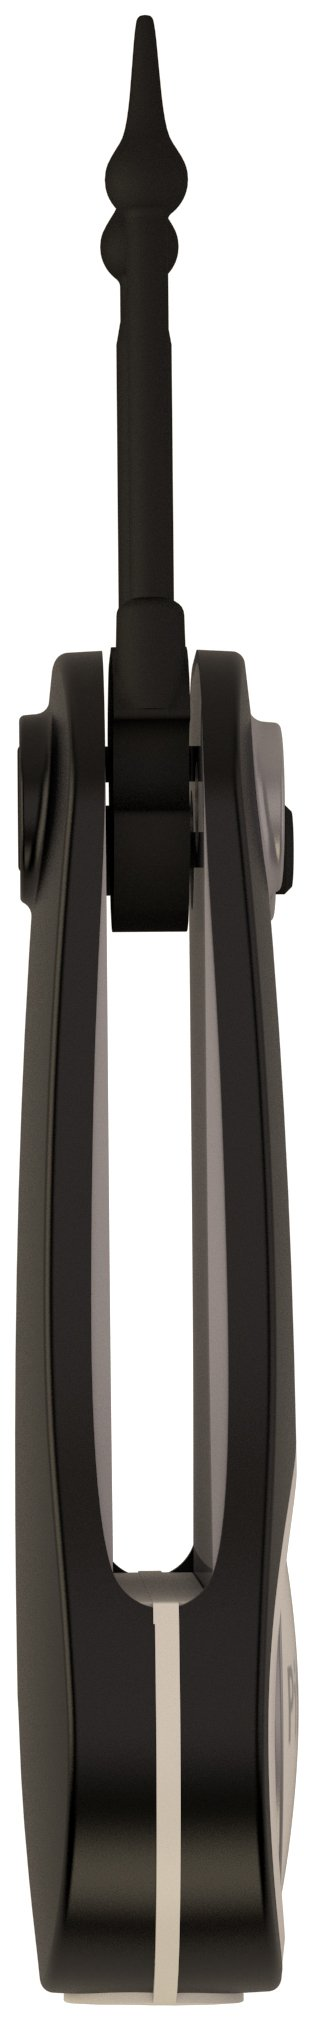 Pitchfix Fusion 2.5 Pin, Black/Silver by Pitchfix (Image #7)